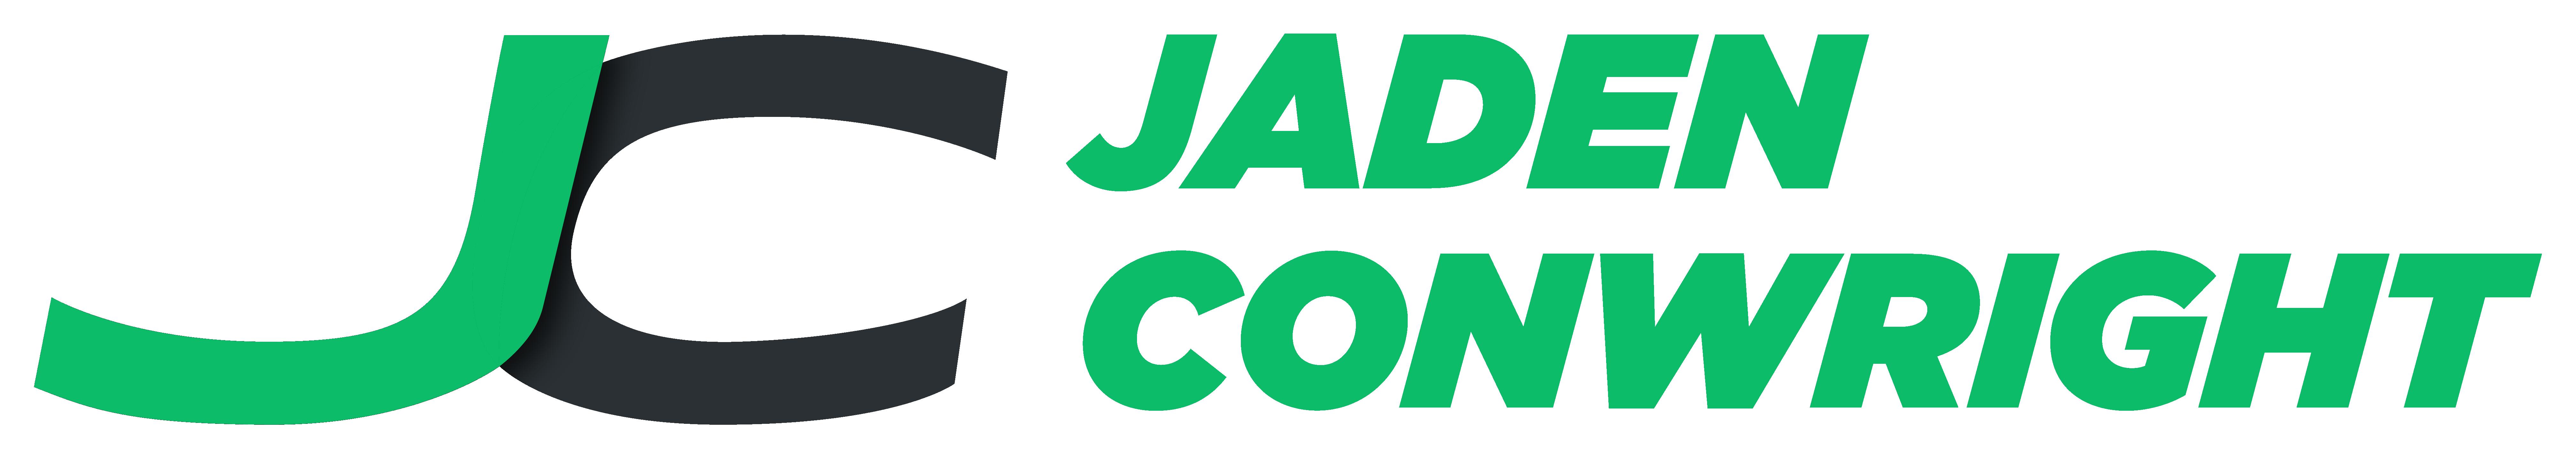 Jaden Conwright